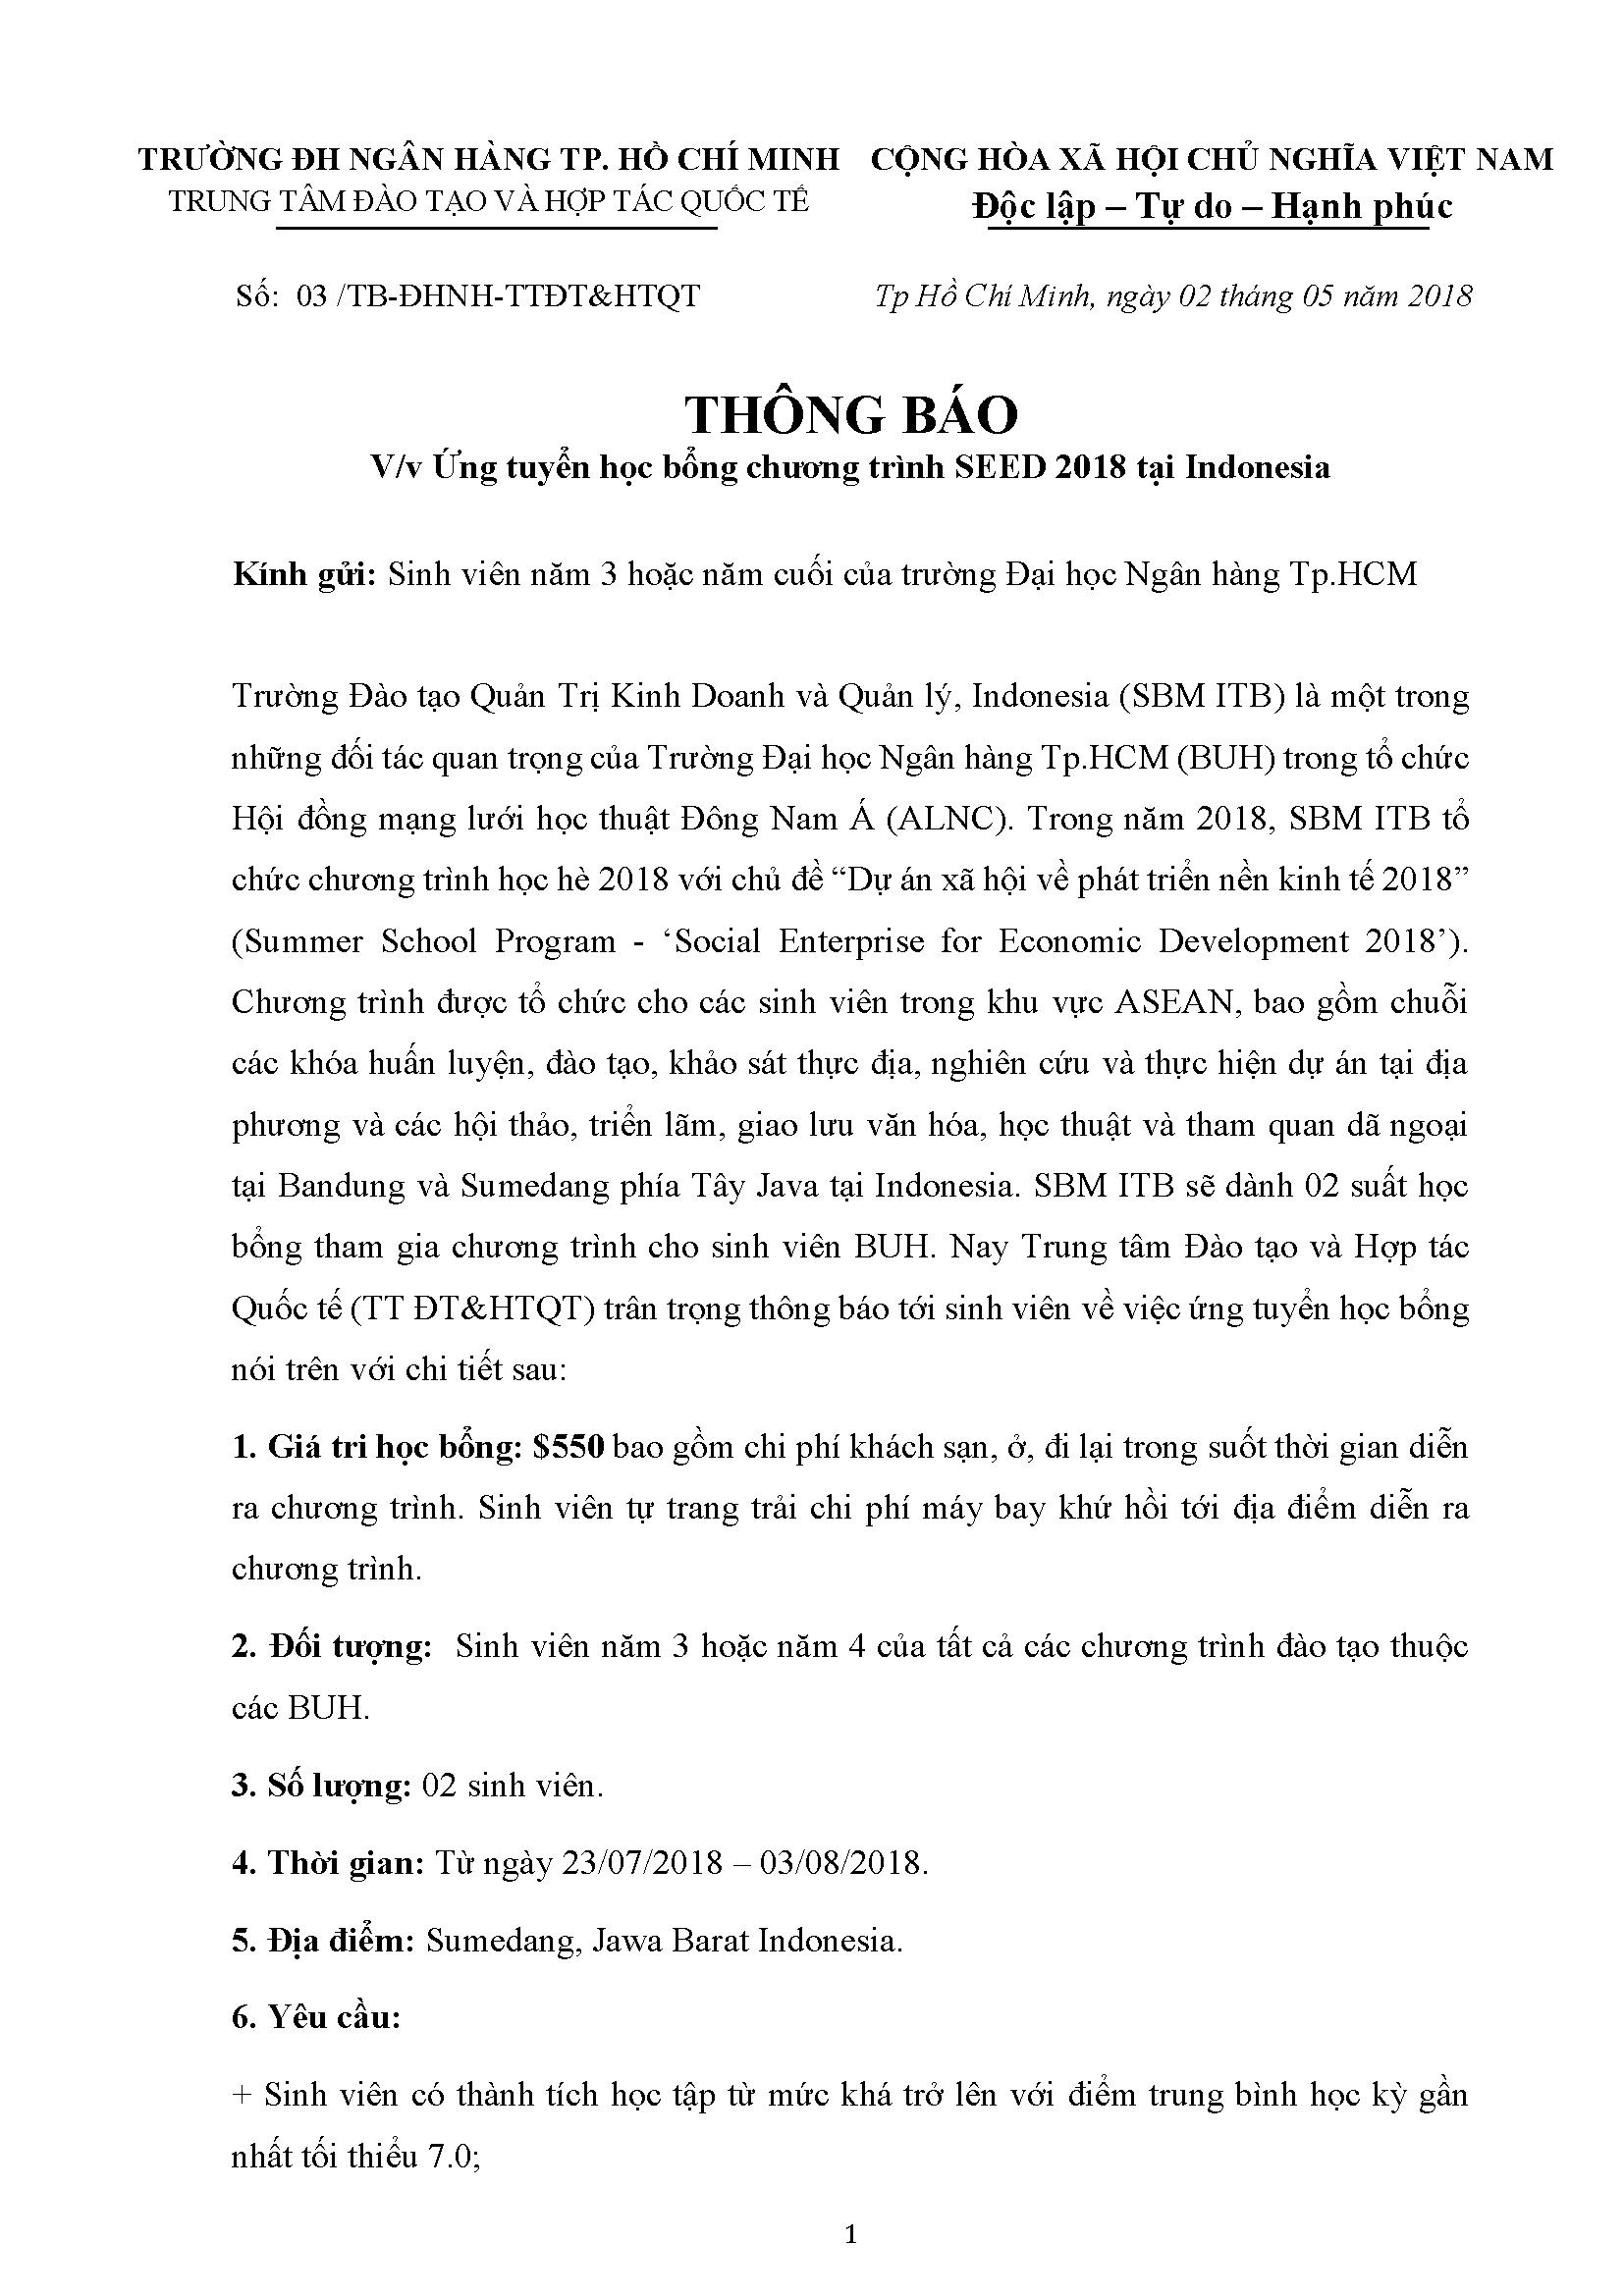 Thong bao hoc bong chuong trinh SEED Indonesia_Page_1